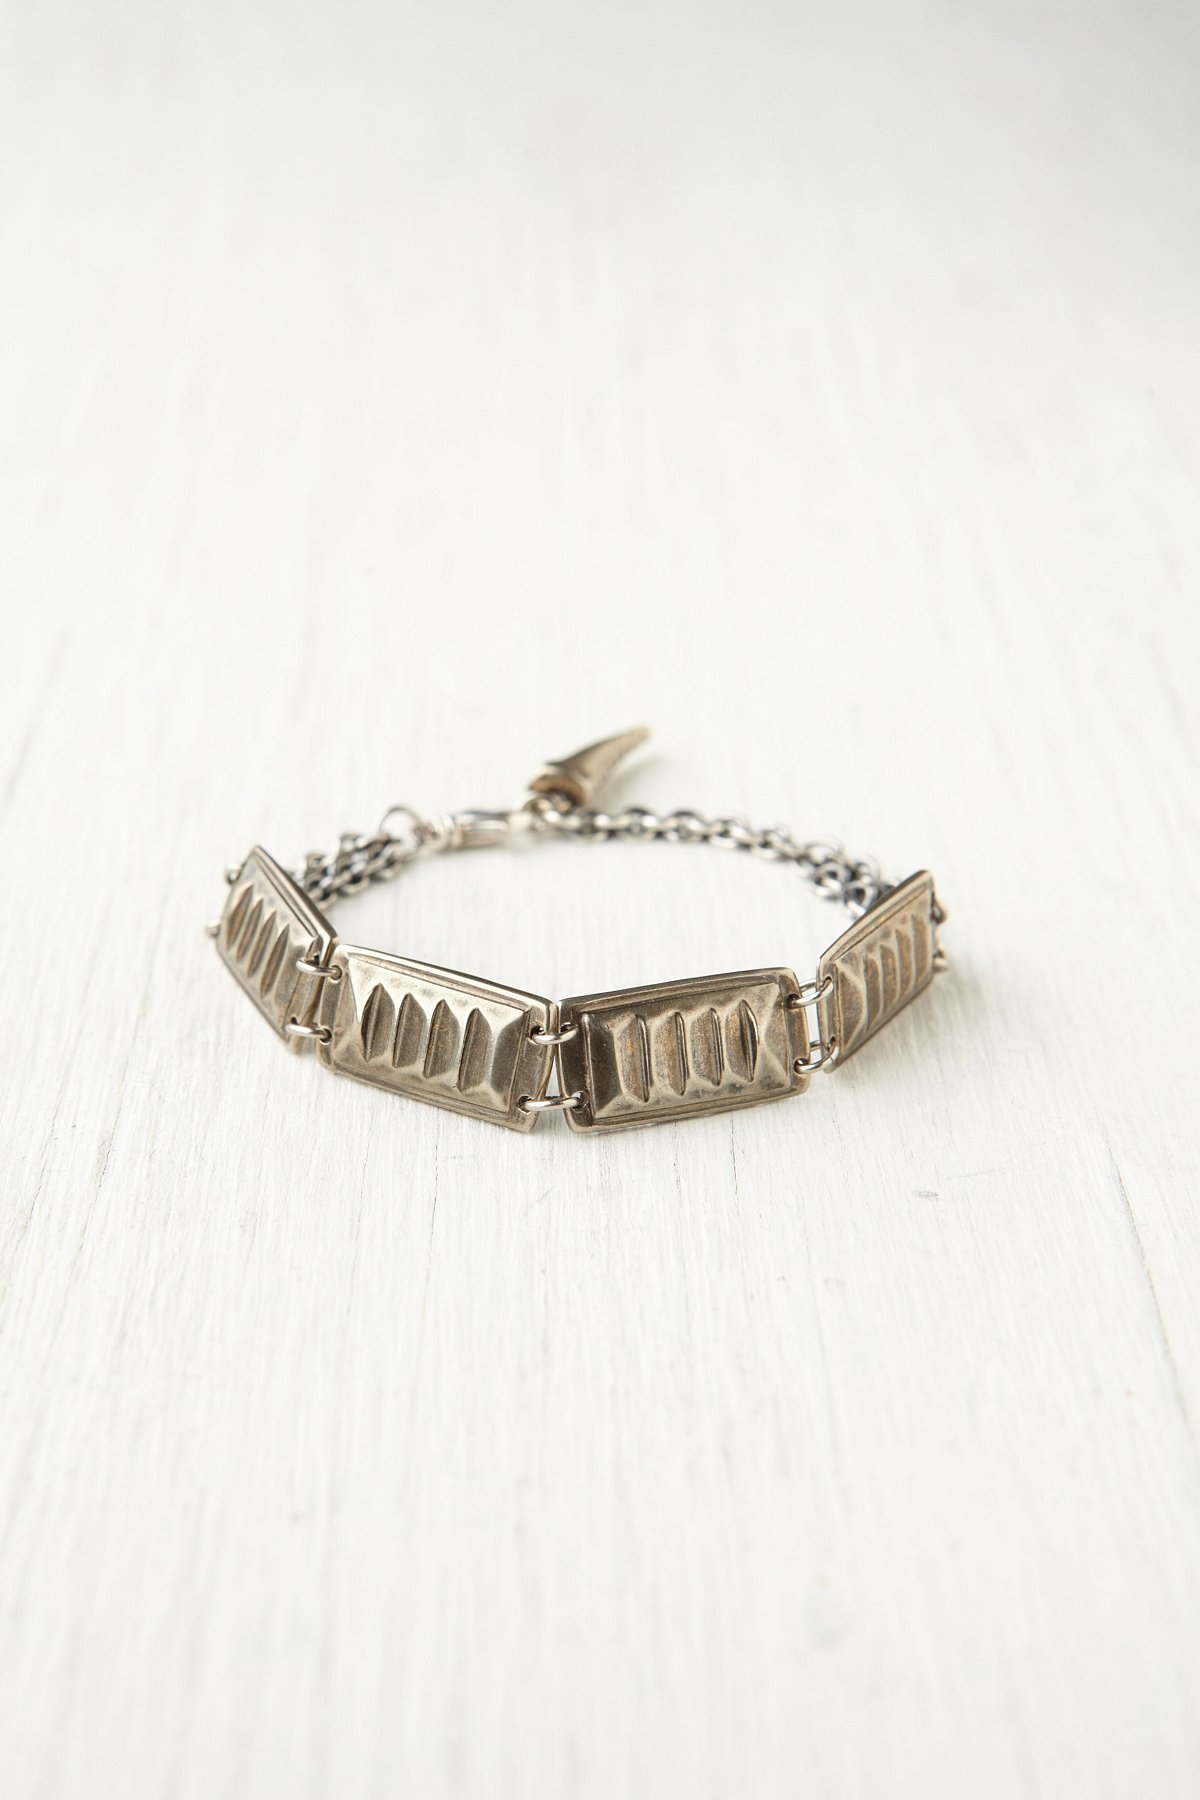 Washboard Bracelet